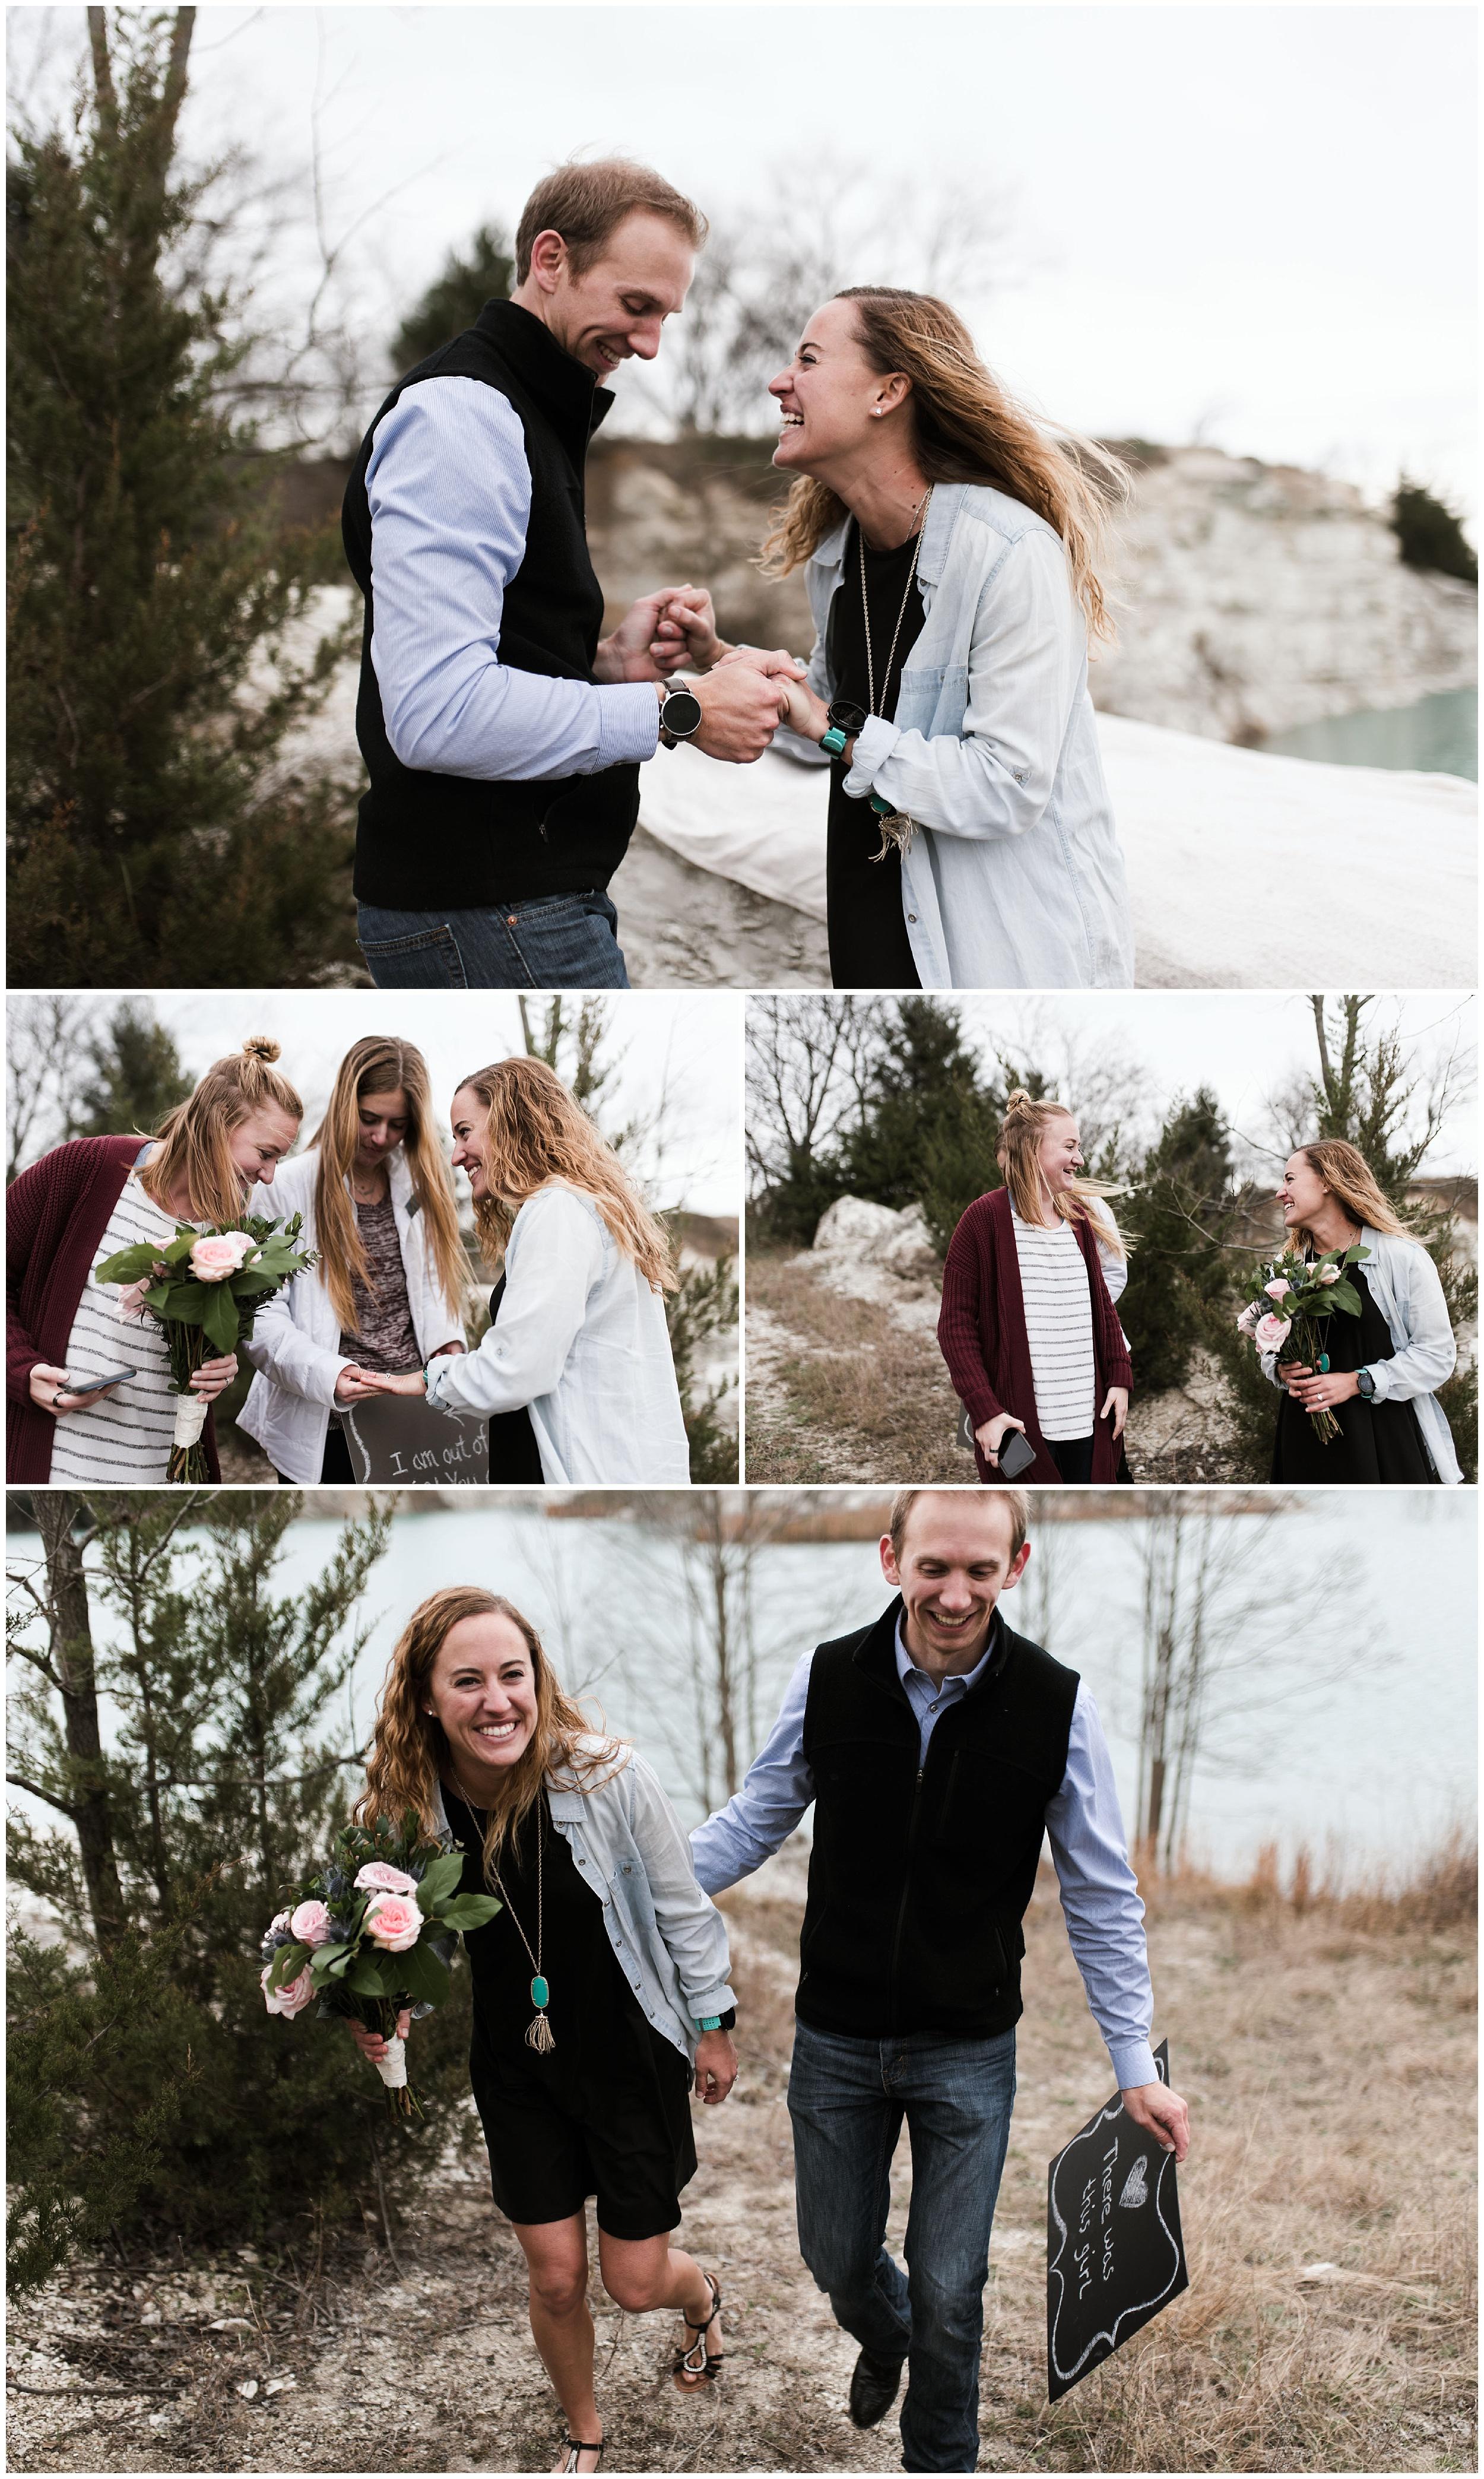 dallas proposal | dallas wedding photographer | Fort Worth wedding photographer | www.jordanmitchellphotography.com